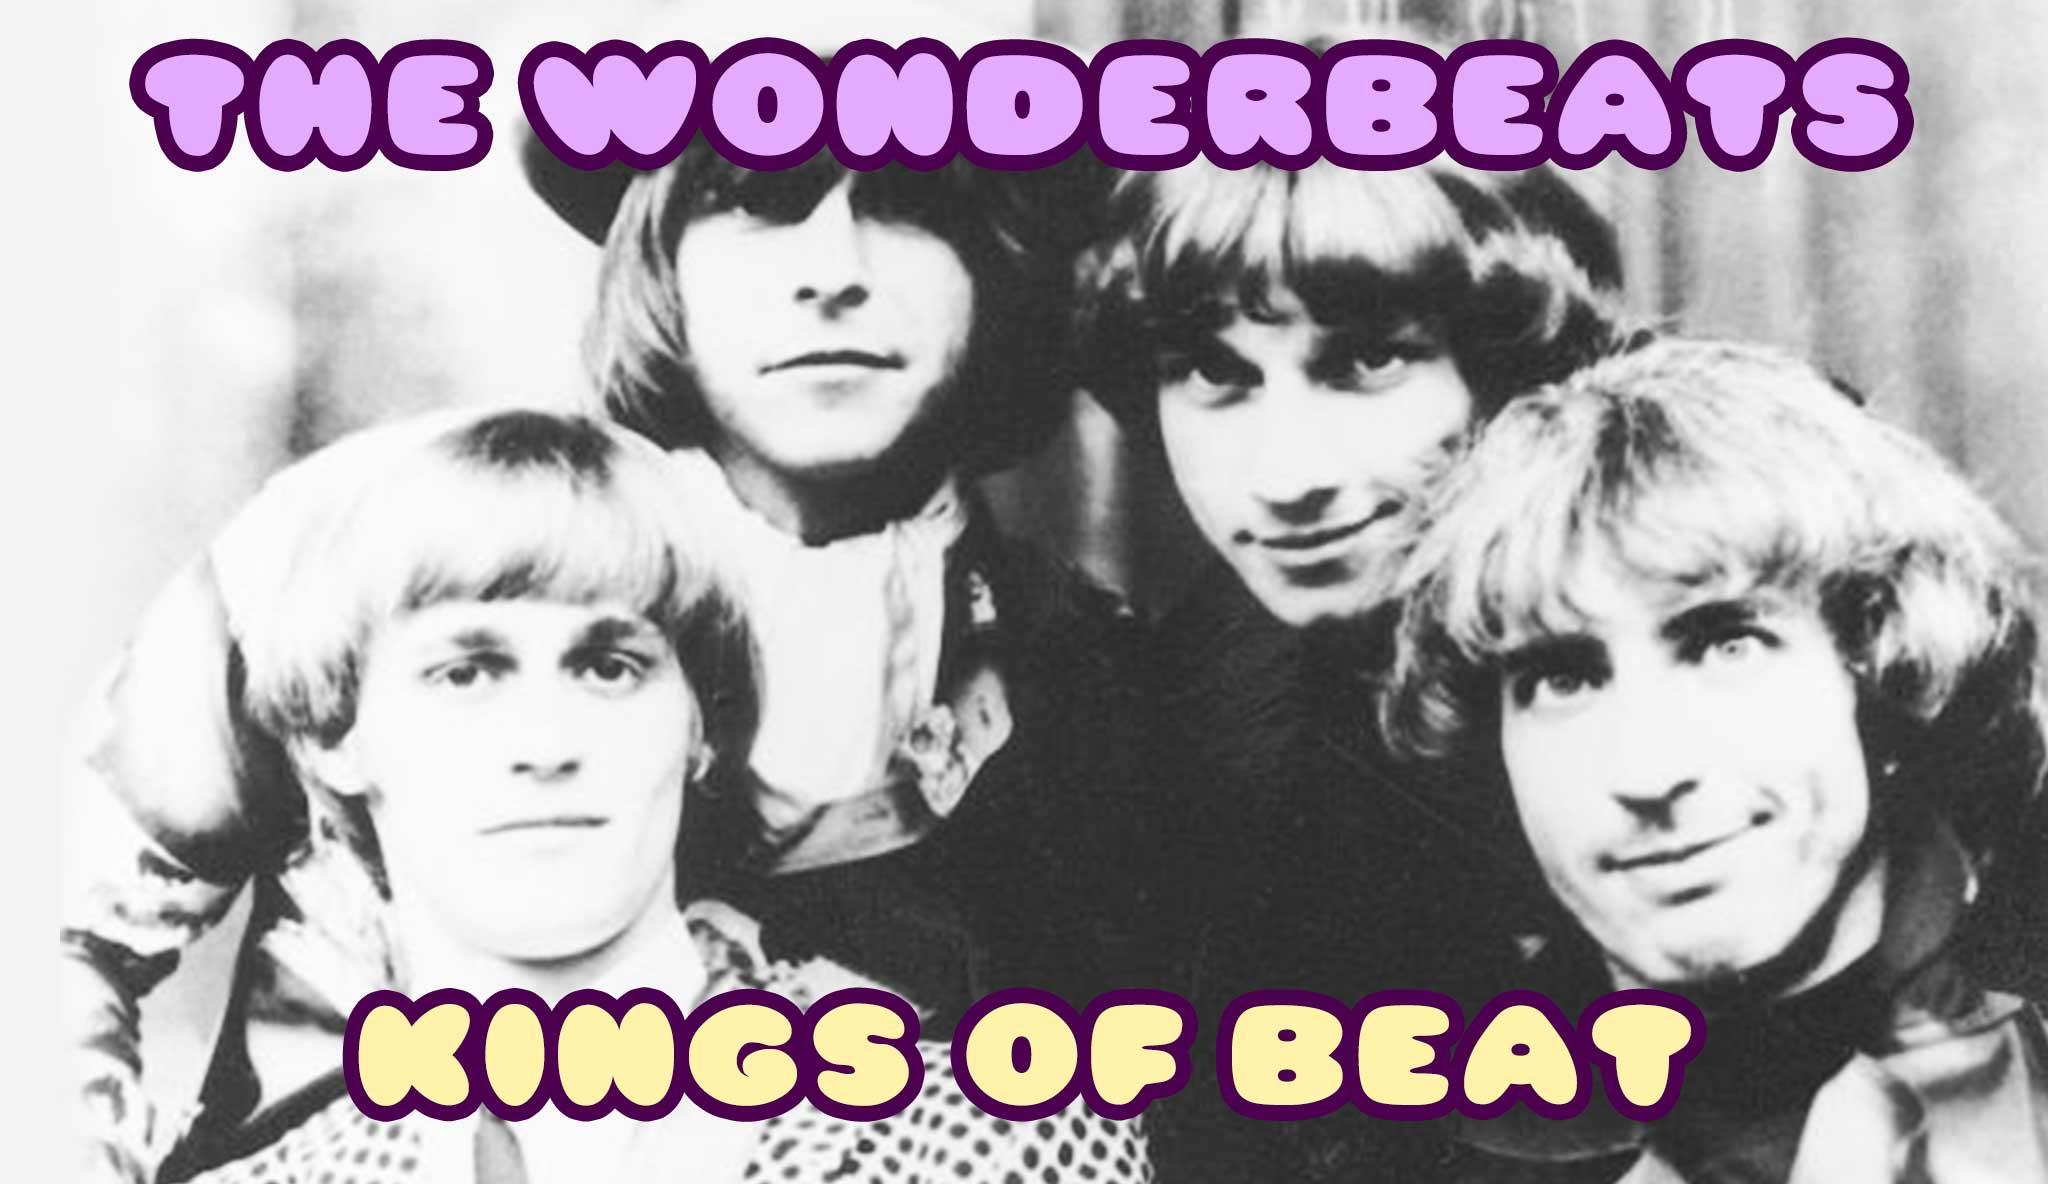 the-wonderbeats-kings-of-beat\header.jpg